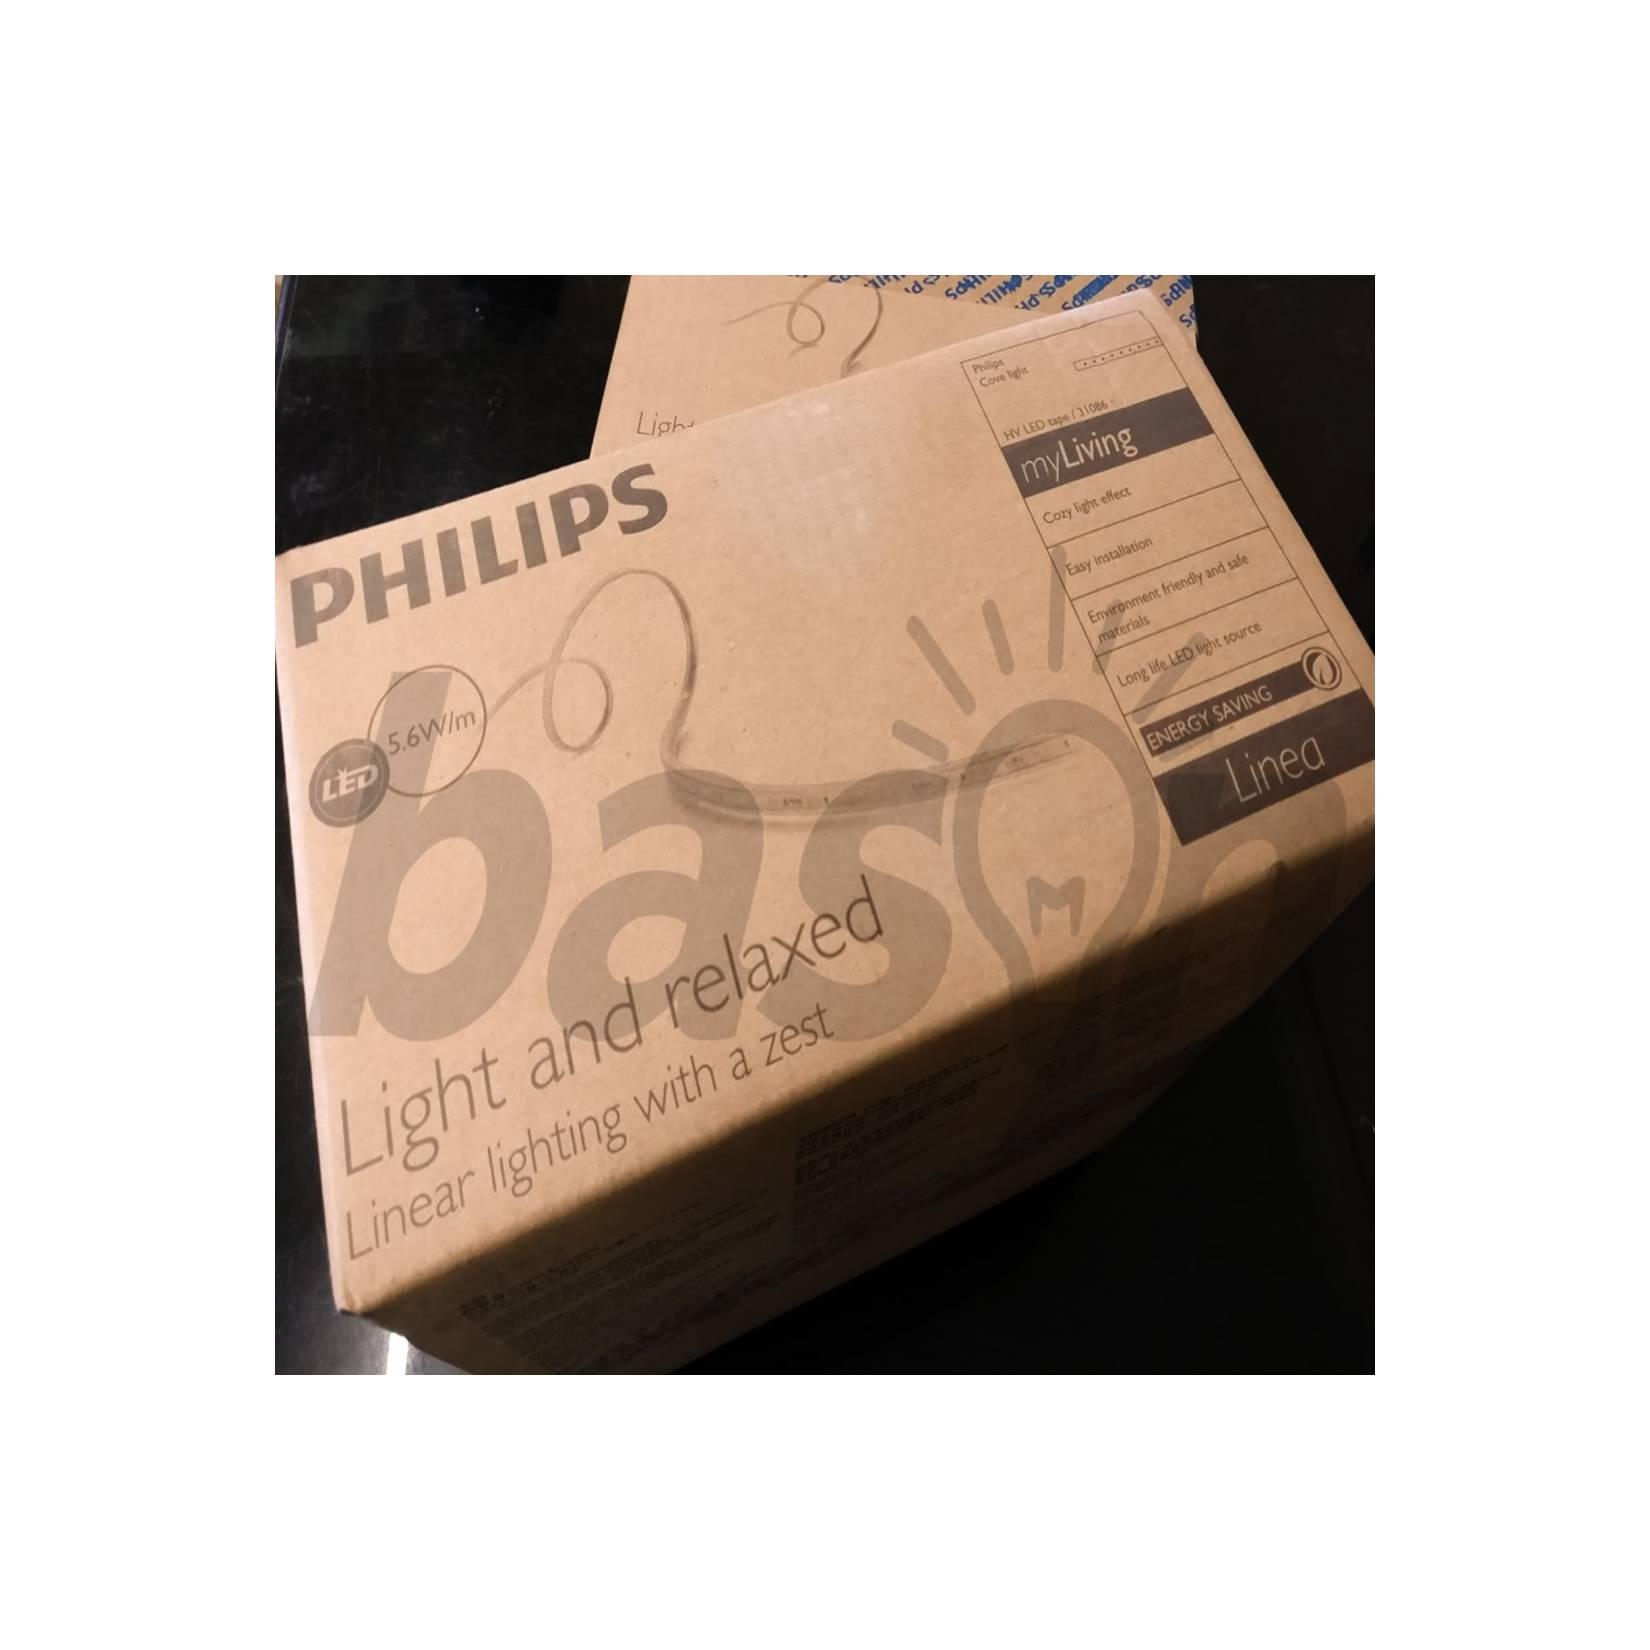 PHILIPS LED Strip DLI 31086 LED Tape High Voltage 50Meter 5.6w/m LL - Warm White